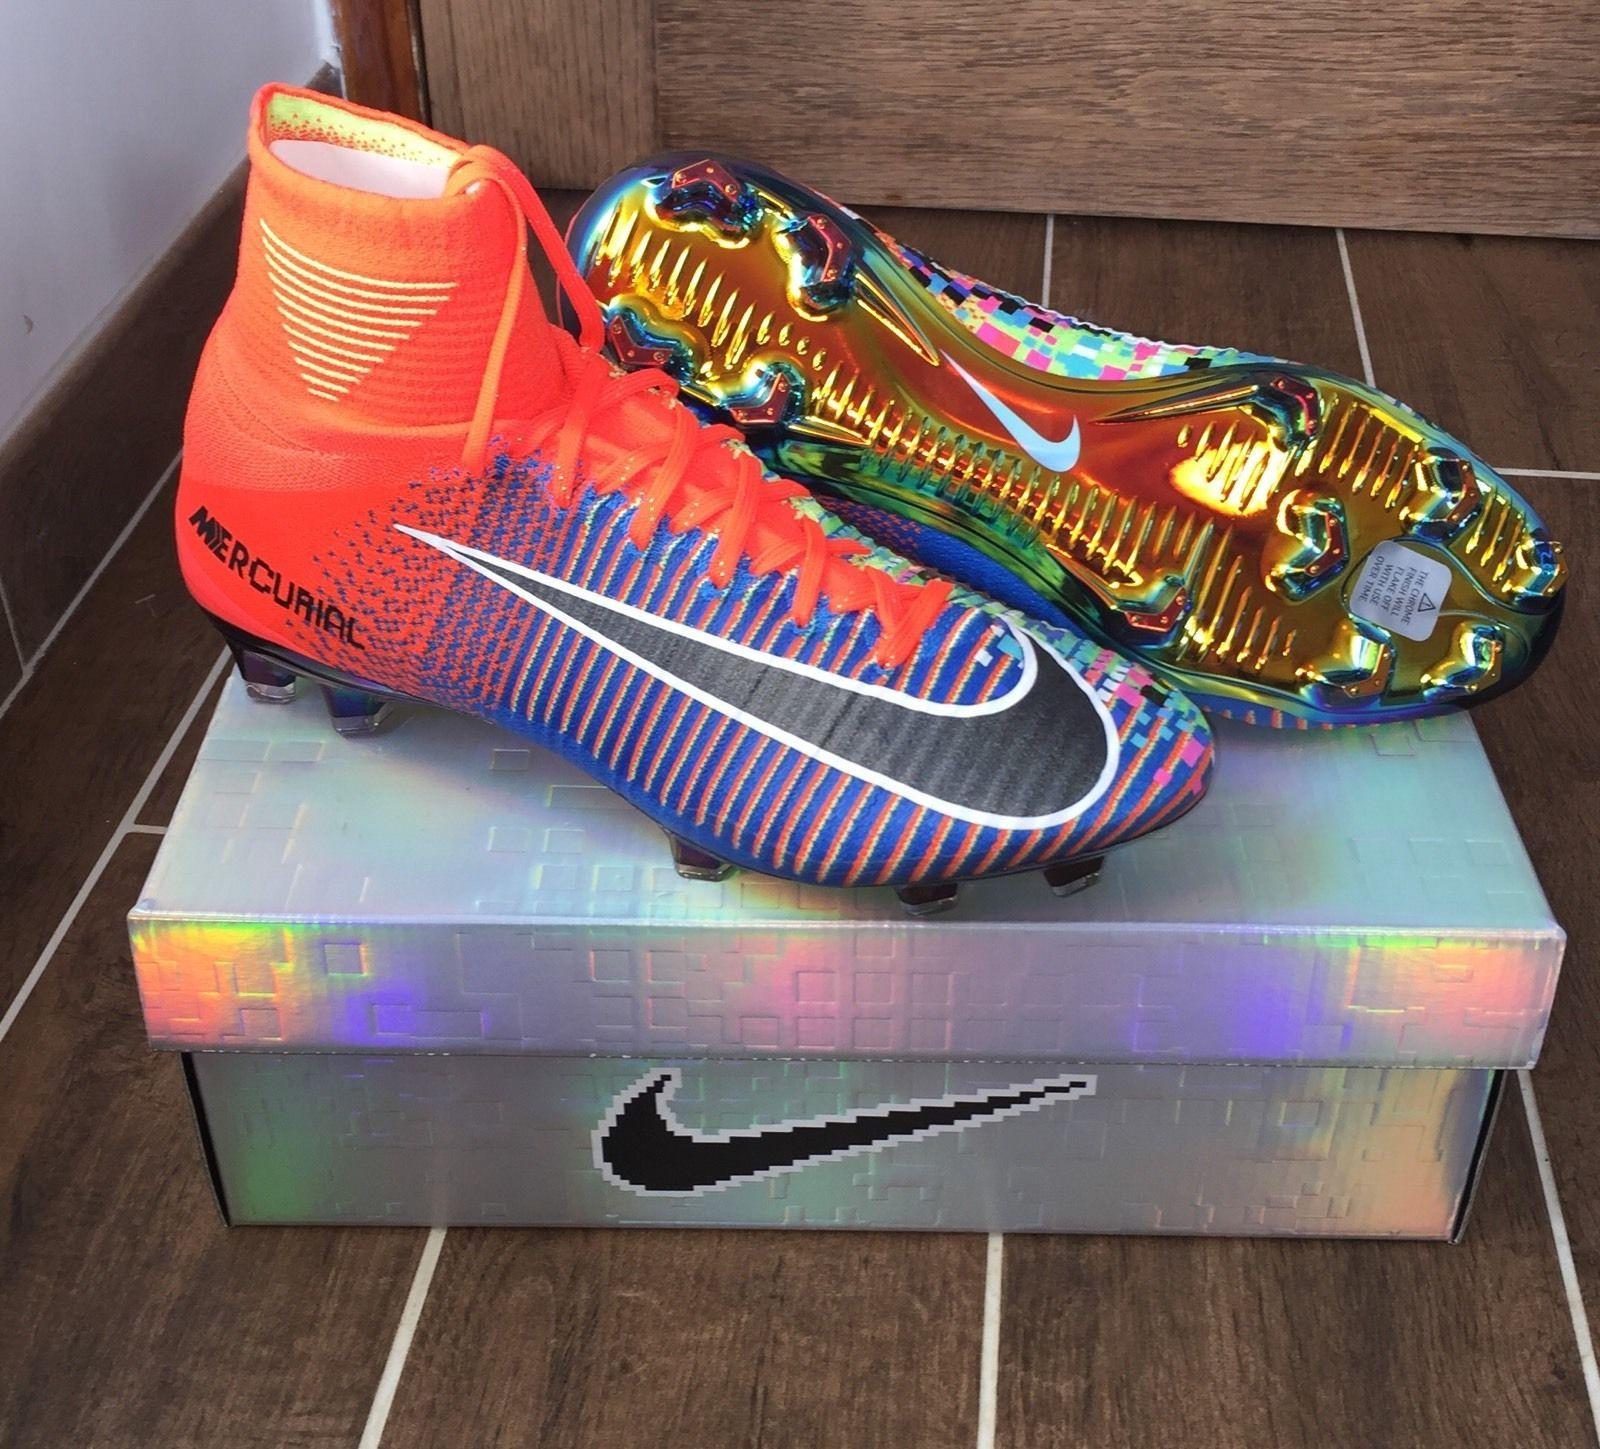 best cheap 90324 f53a2 Nike Football X EA Sports Mercurial Superfly FG Cramoisi total Code du  produit 852512-804